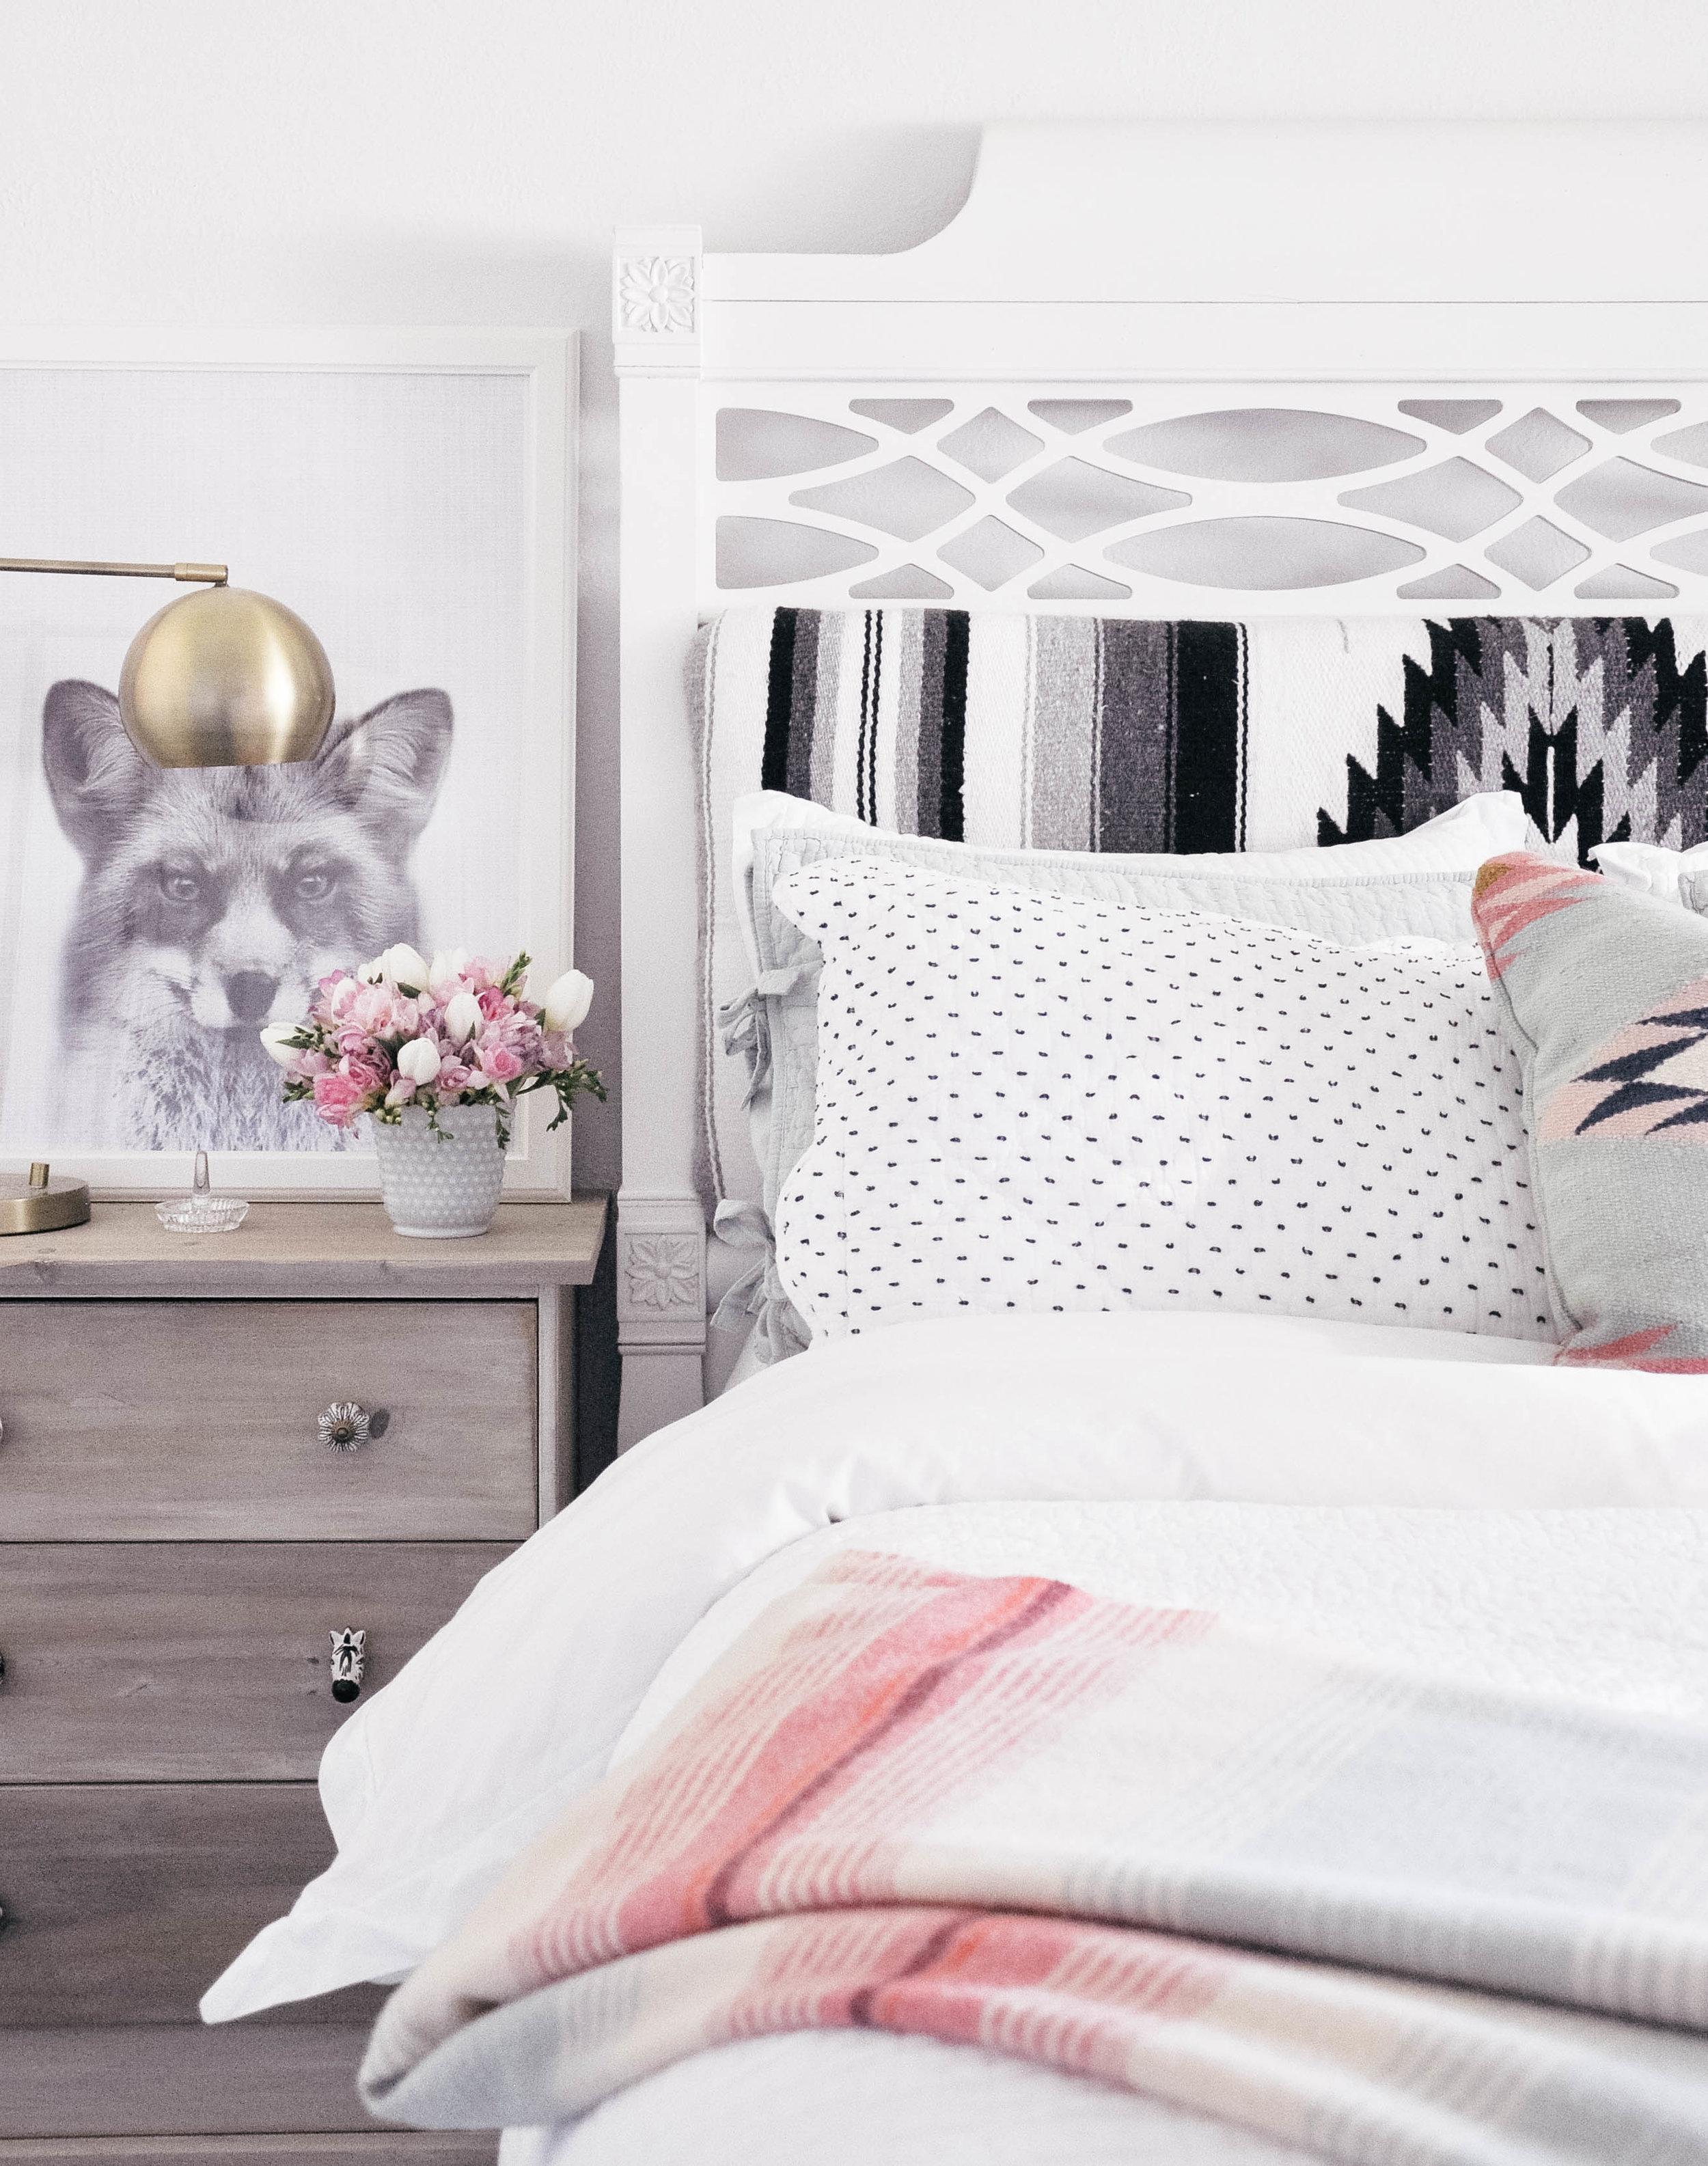 DIY Upholstered Fabric Headboard Ideas